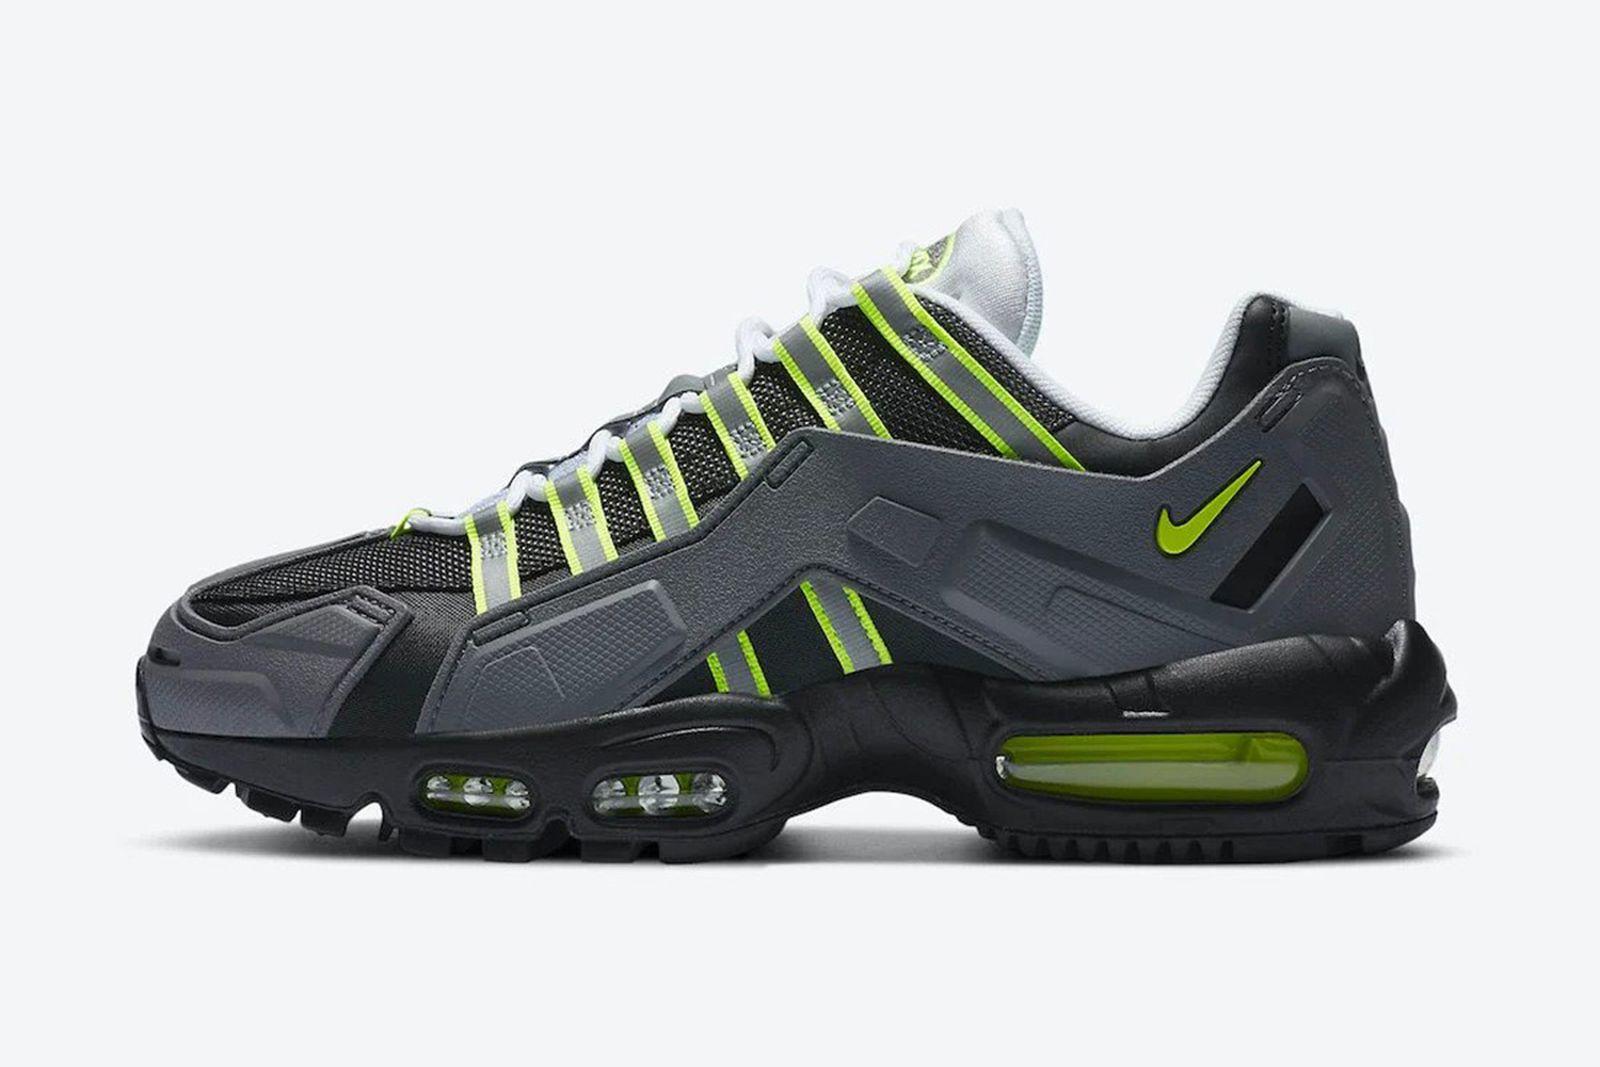 nike-air-max-95-ndstrkt-neon-release-date-price-02